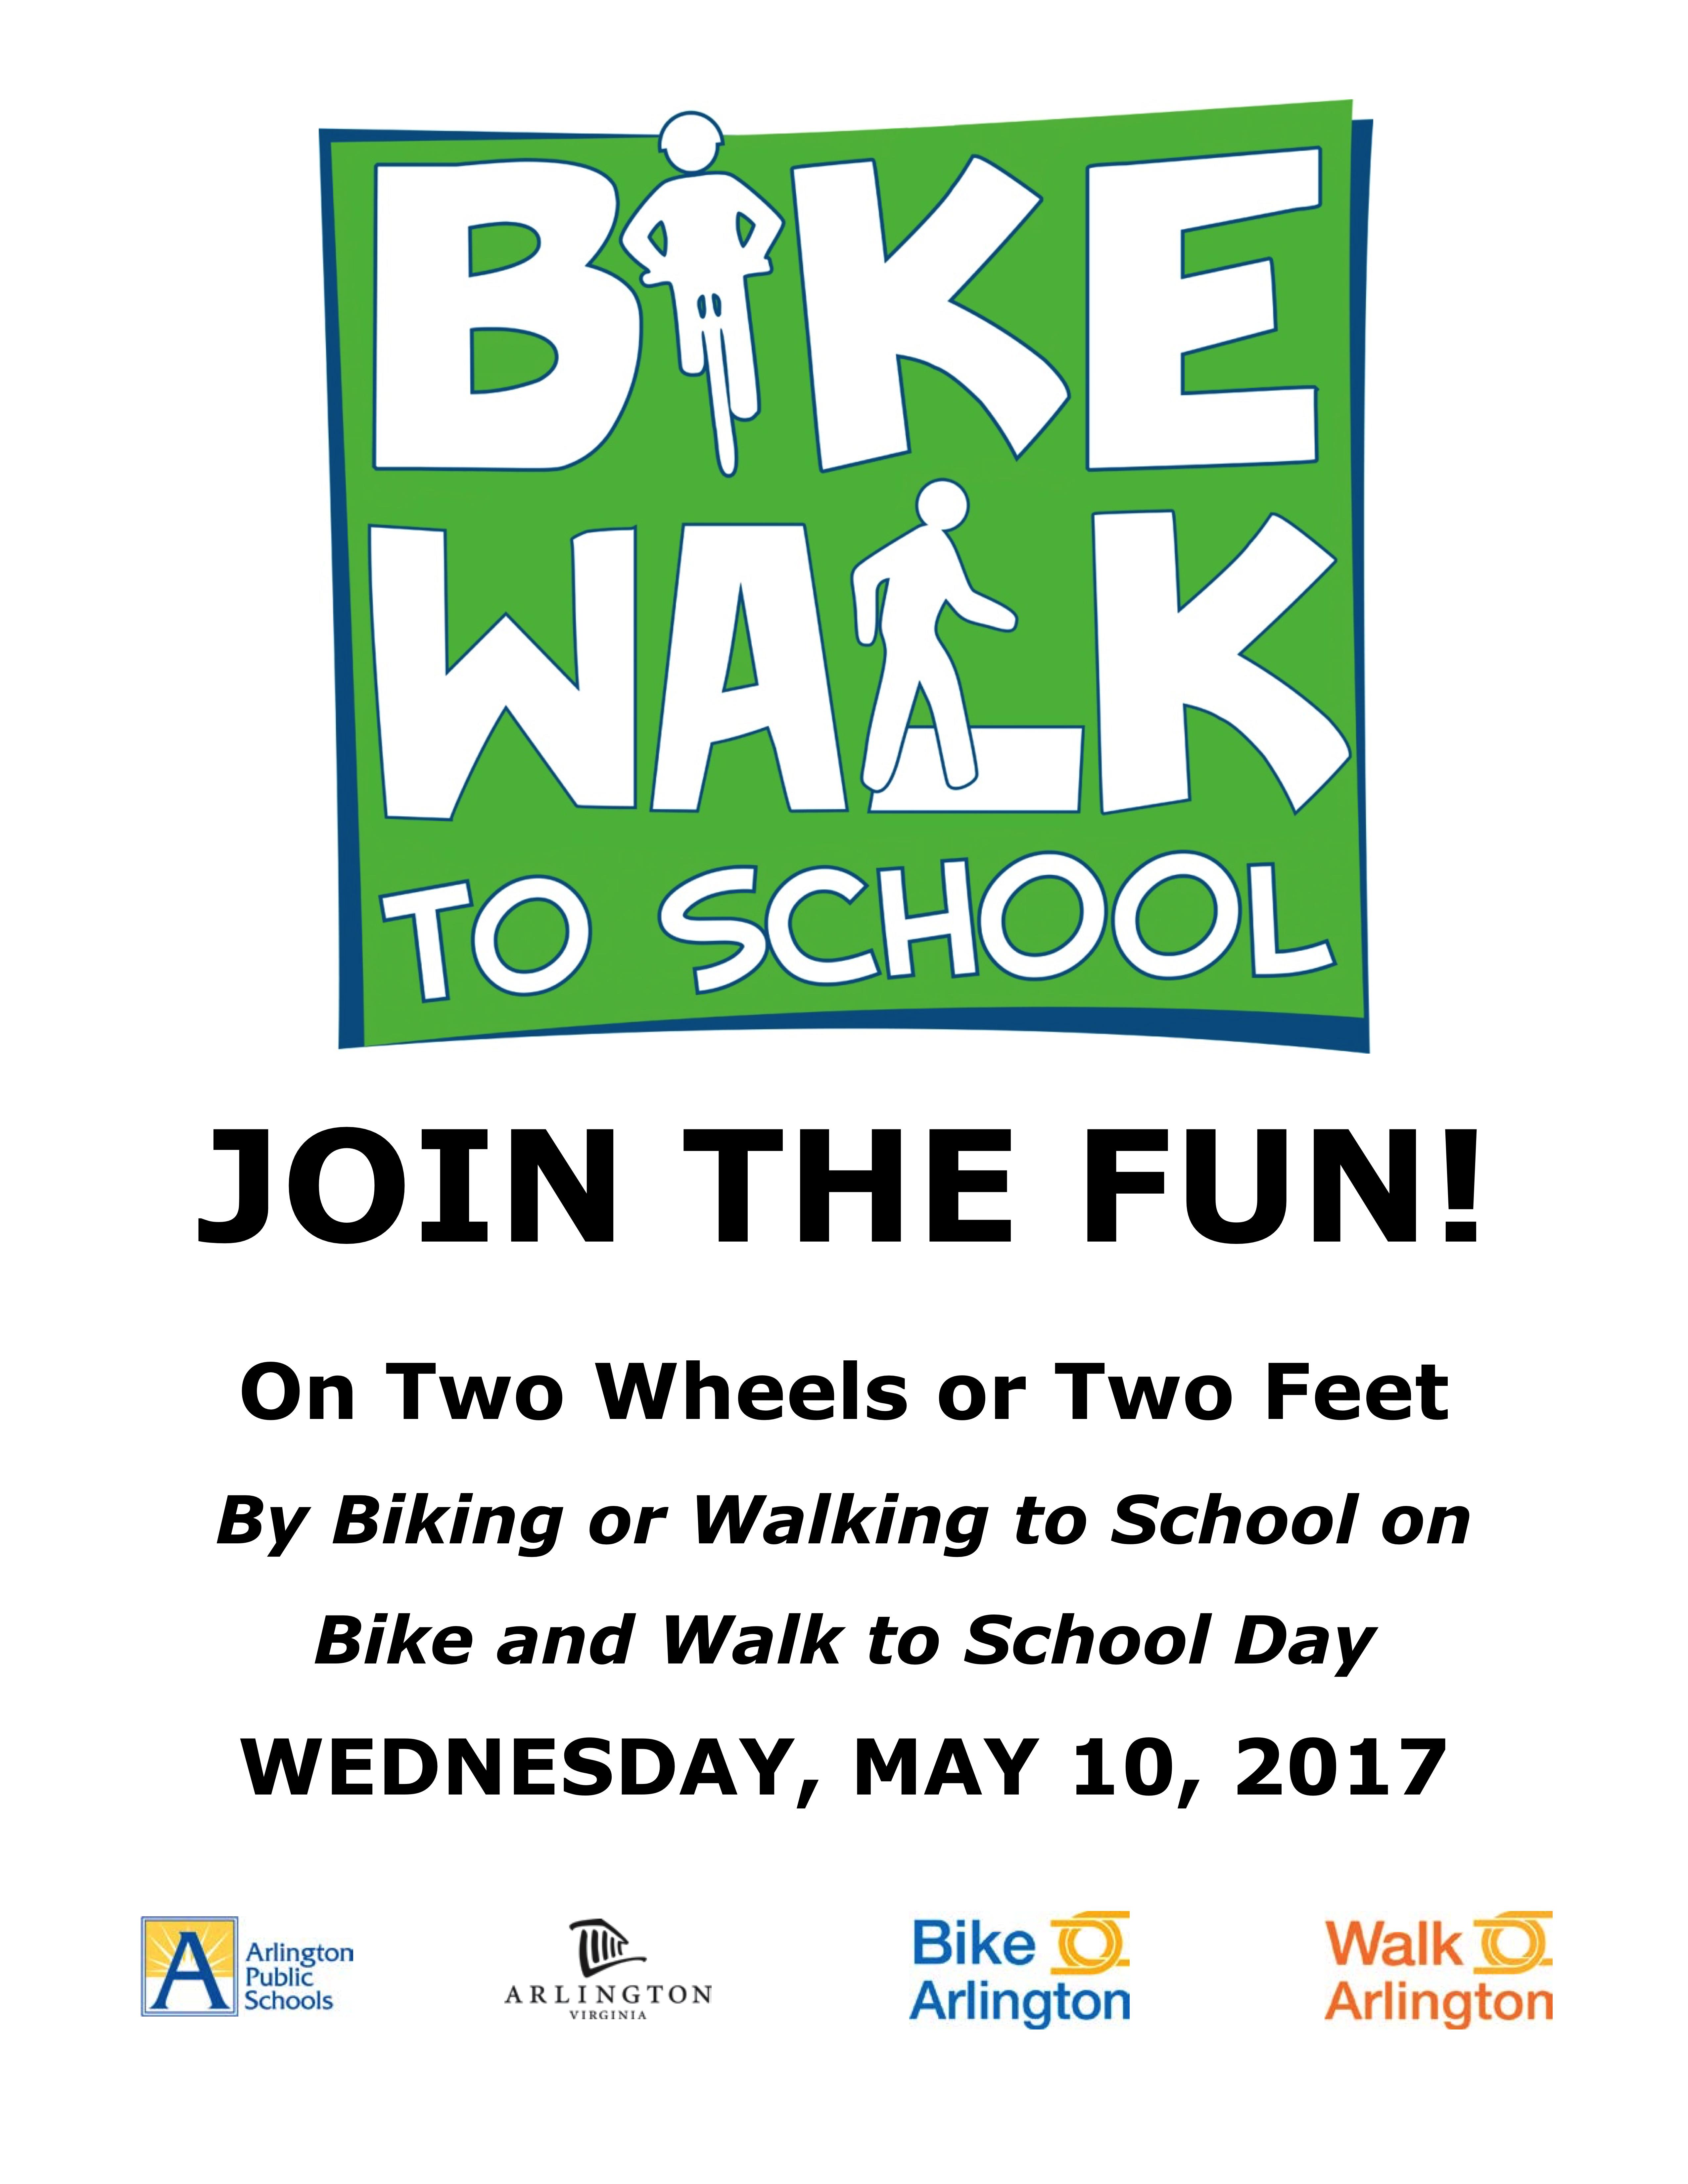 Bike & Walk to School Flyer On Two Wheels or Two Feet By Biking or Walking to School on Bike and Walk to School Day WEDNESDAY, MAY 10, 2017